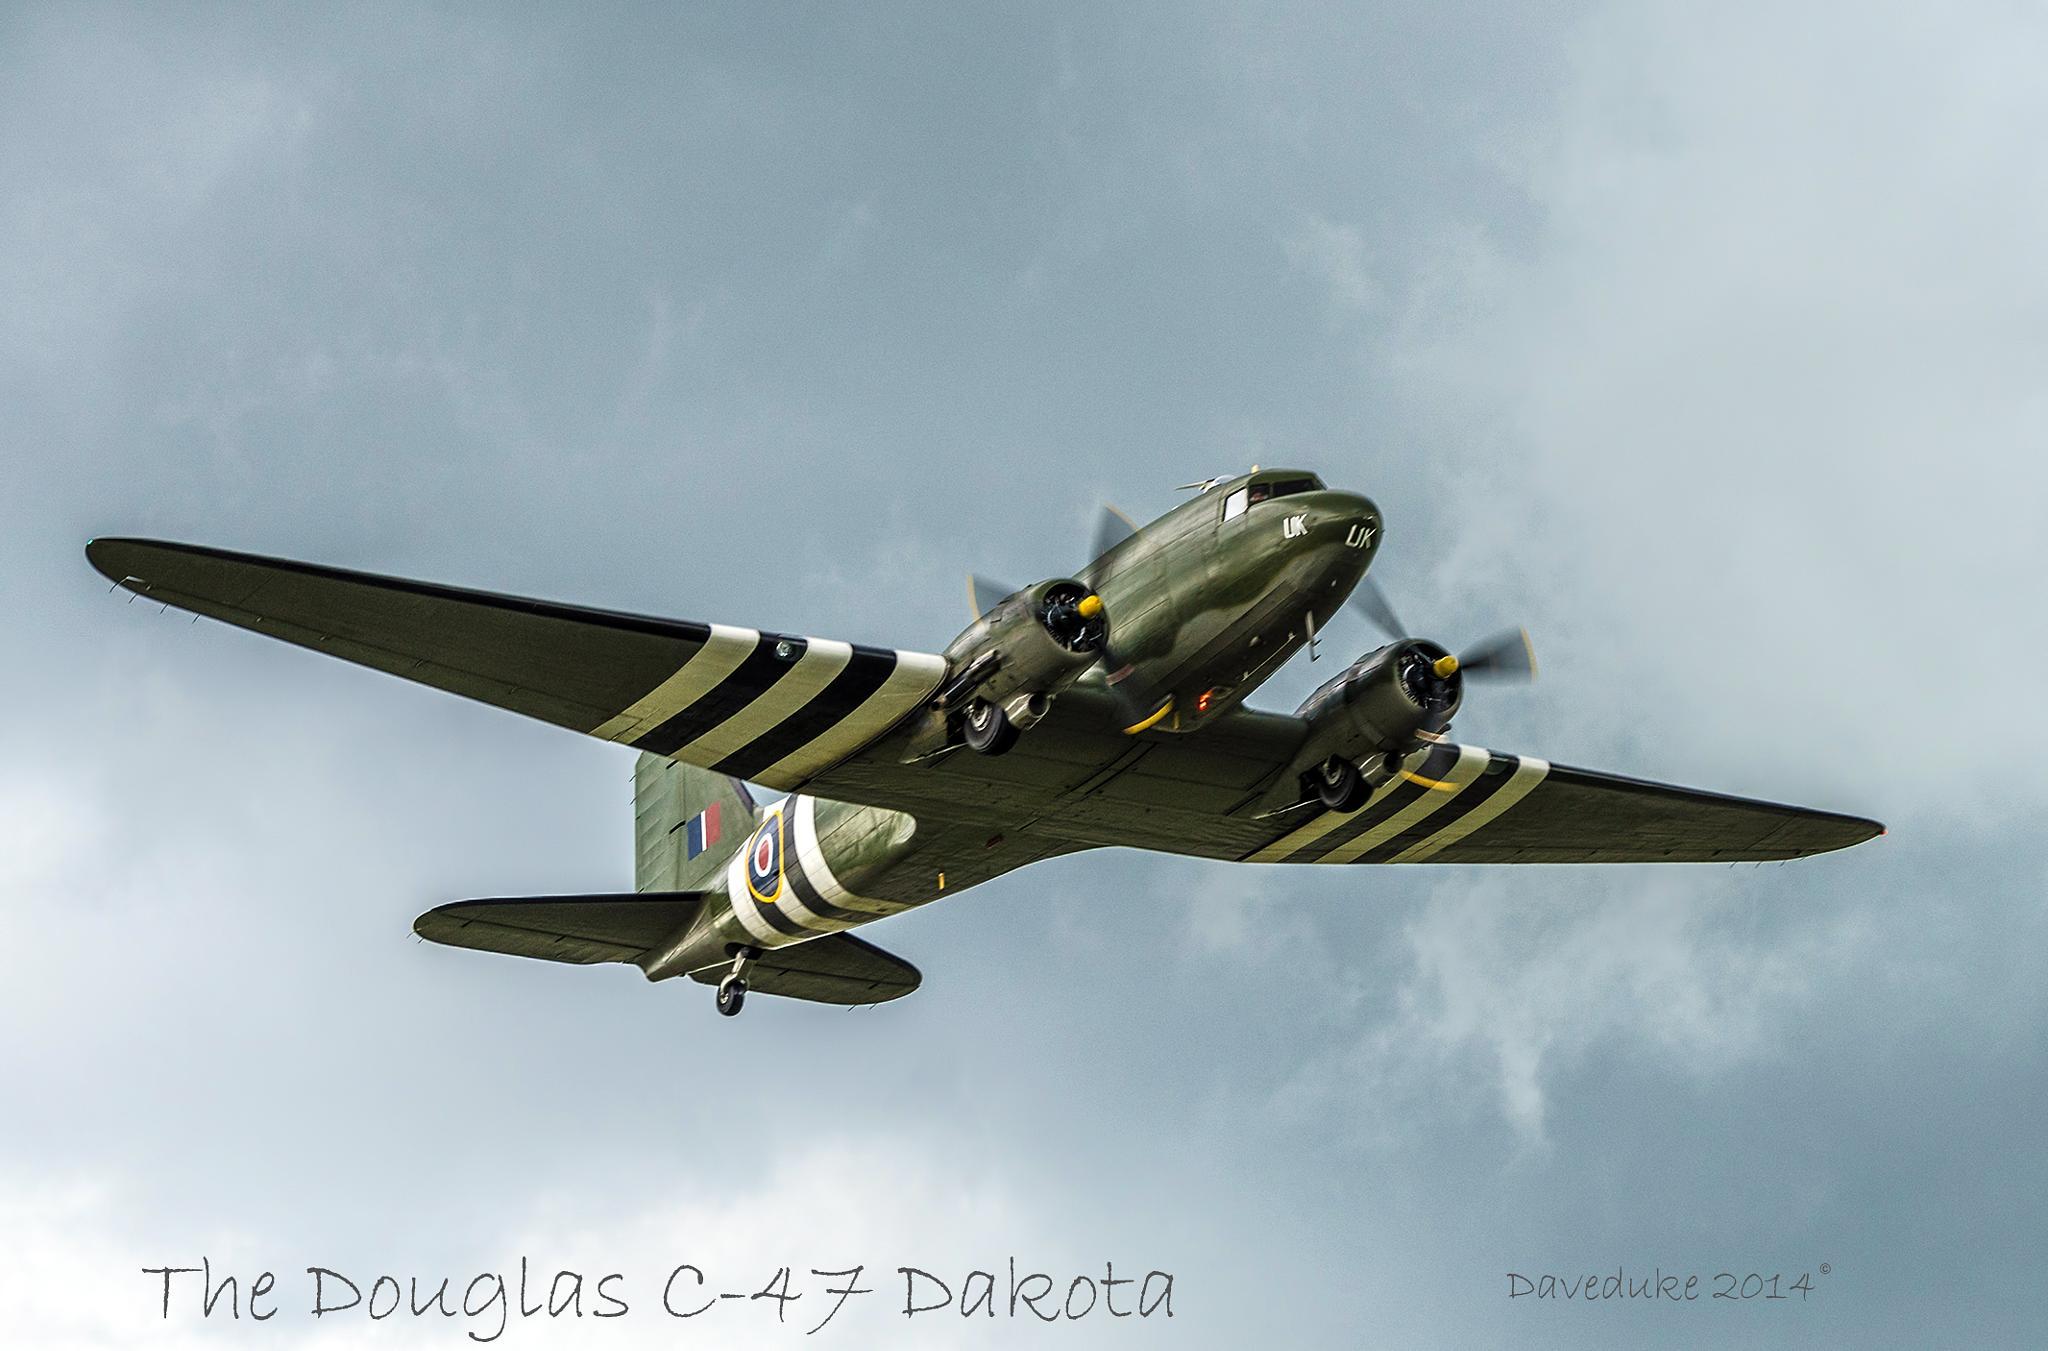 The Douglas C-47 Dakota by daviddukesell